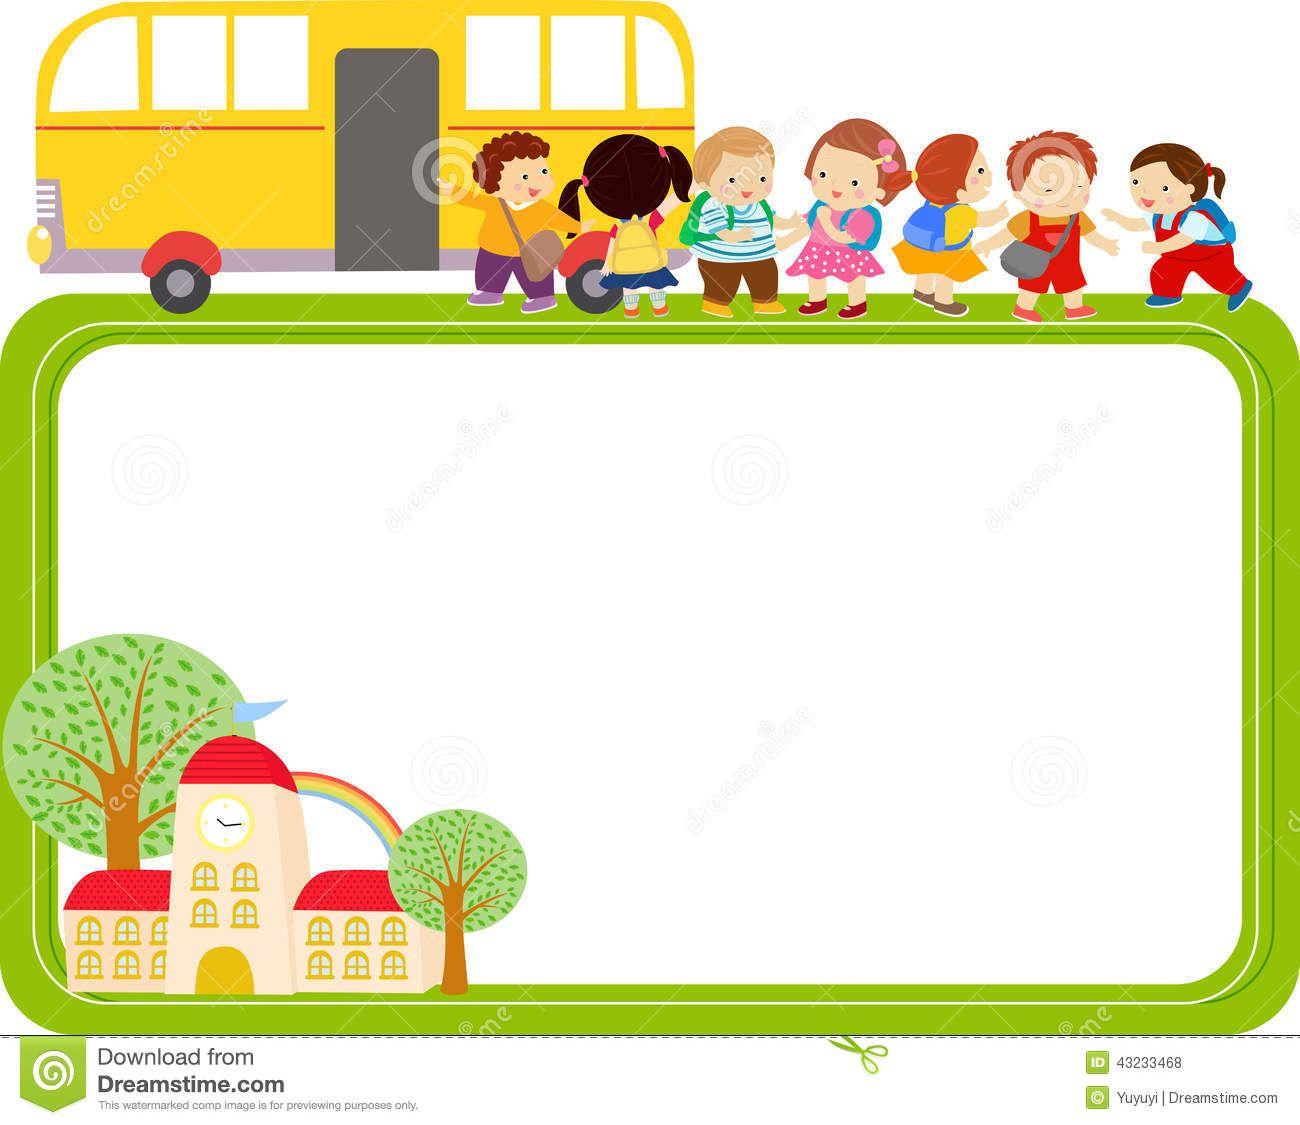 Bus clipart border, Bus border Transparent FREE for download.